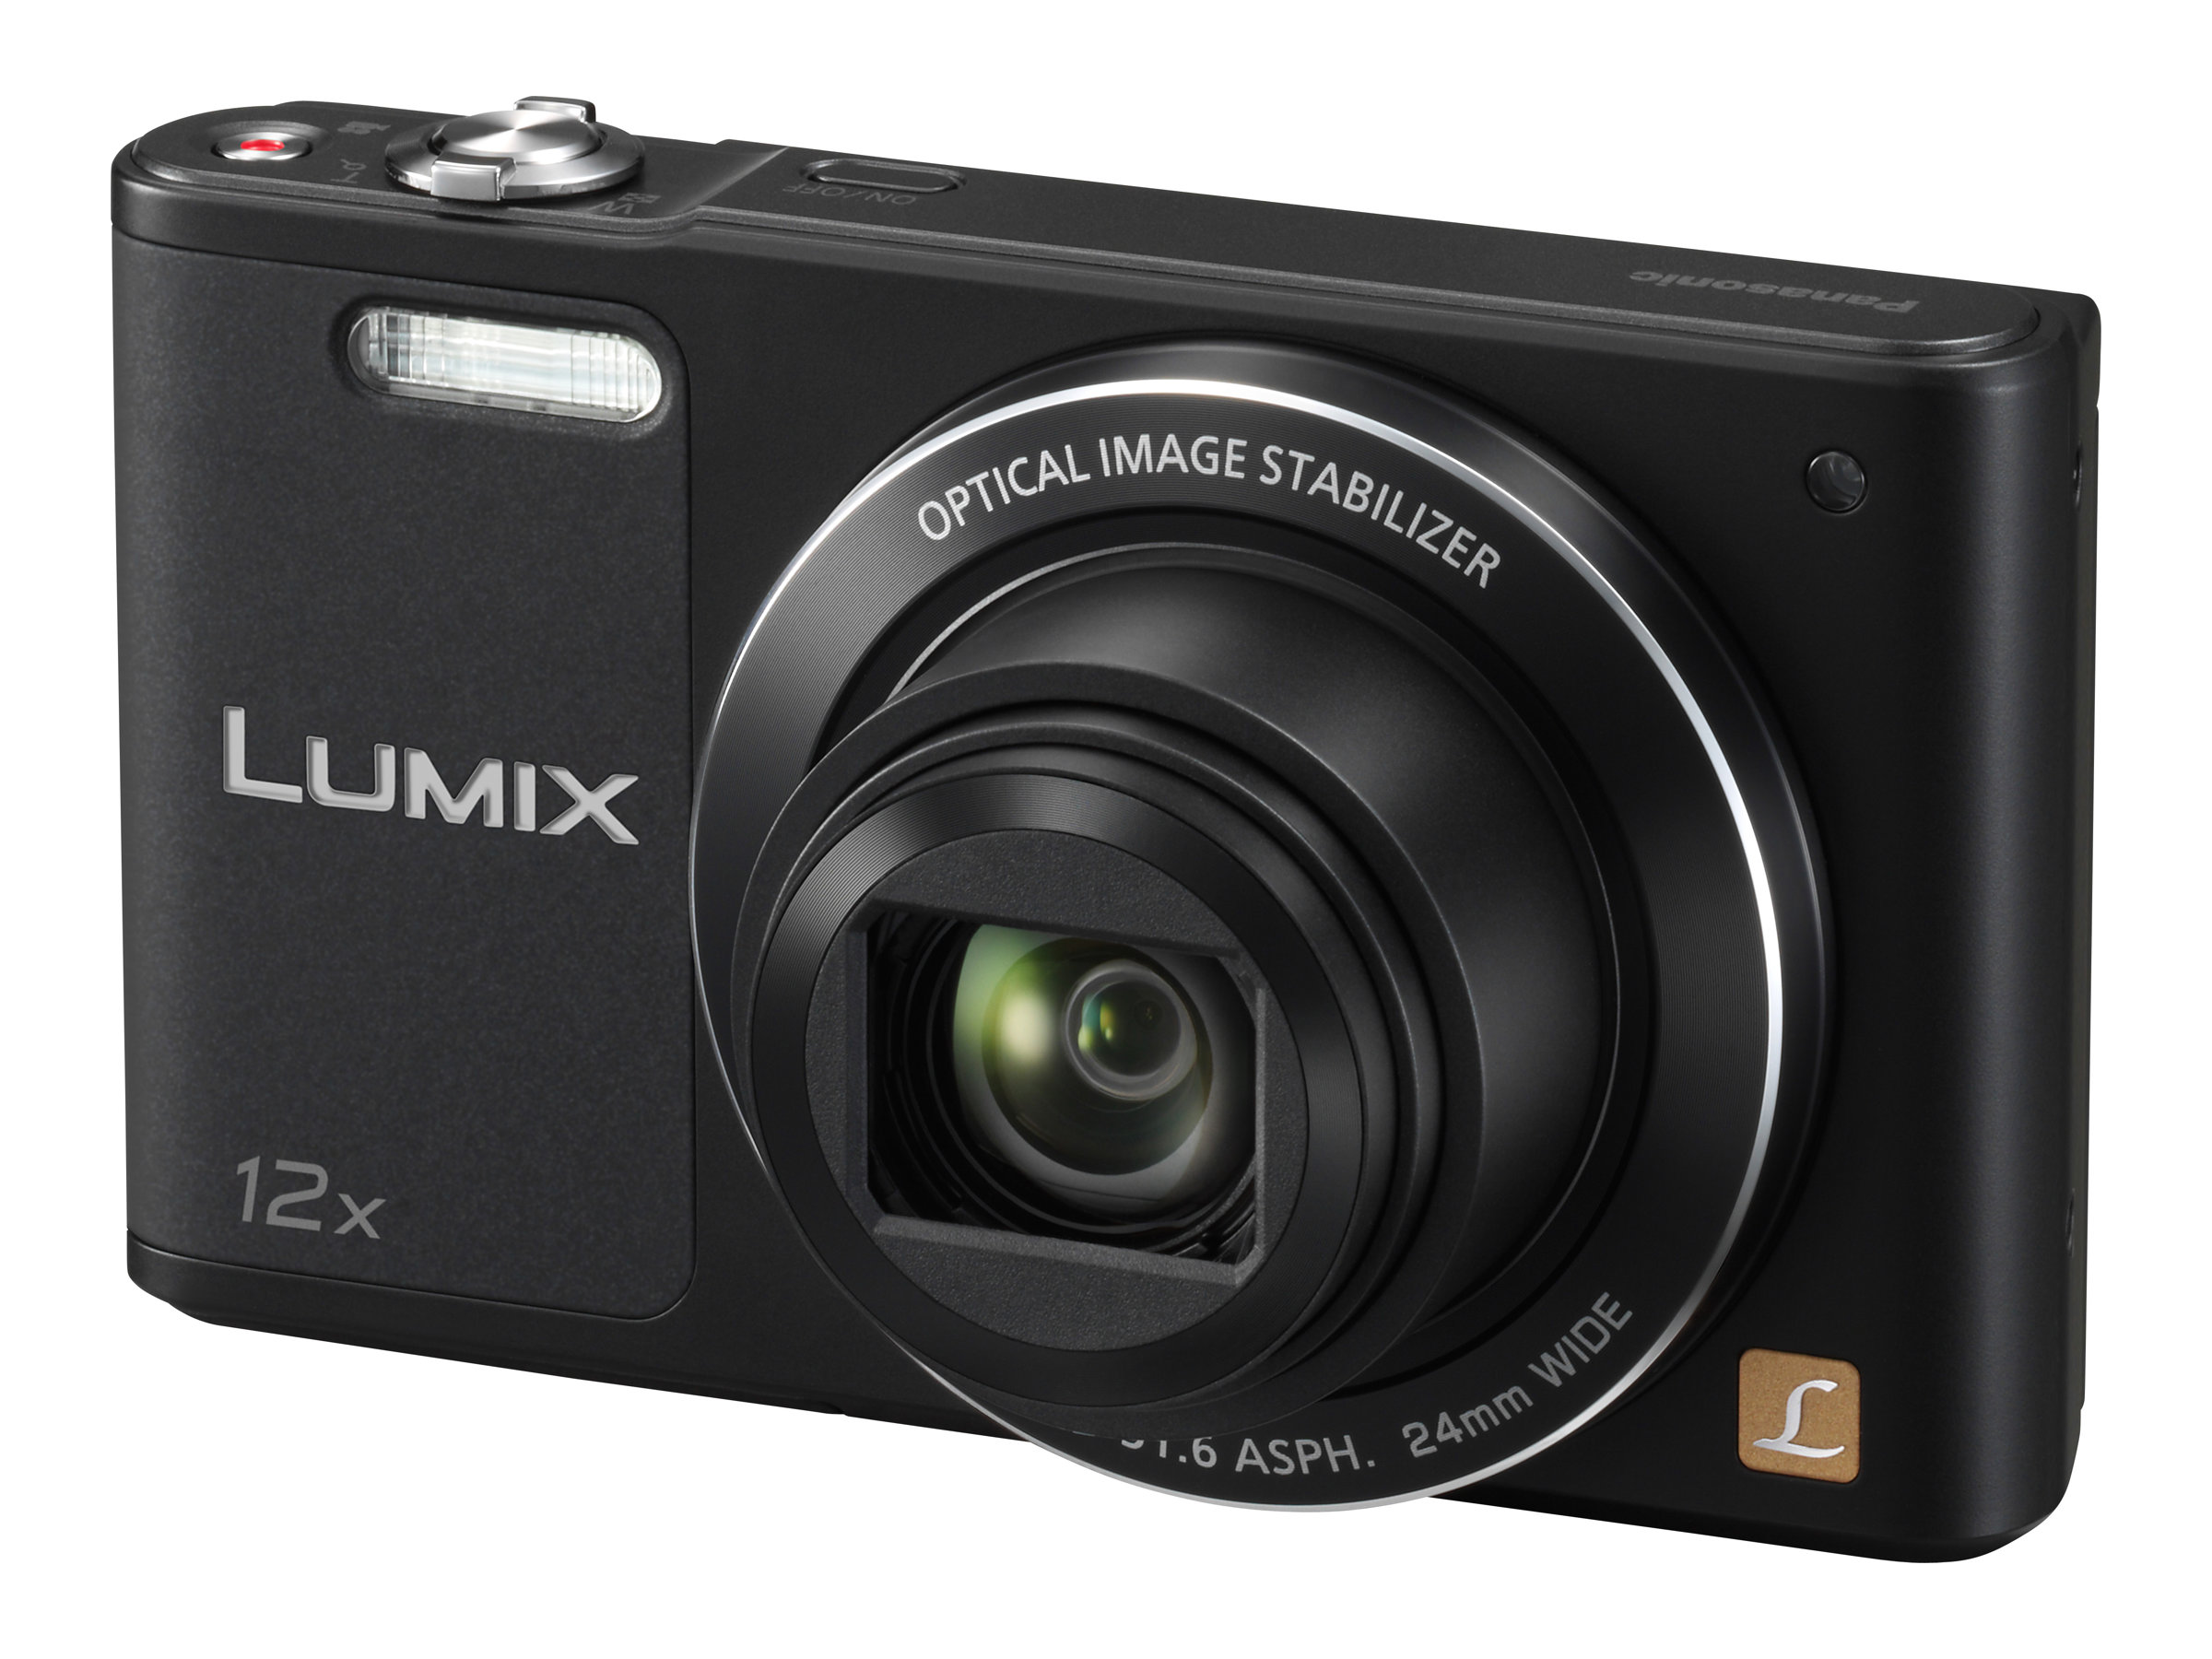 Panasonic Lumix DMC-SZ10 - Digitalkamera